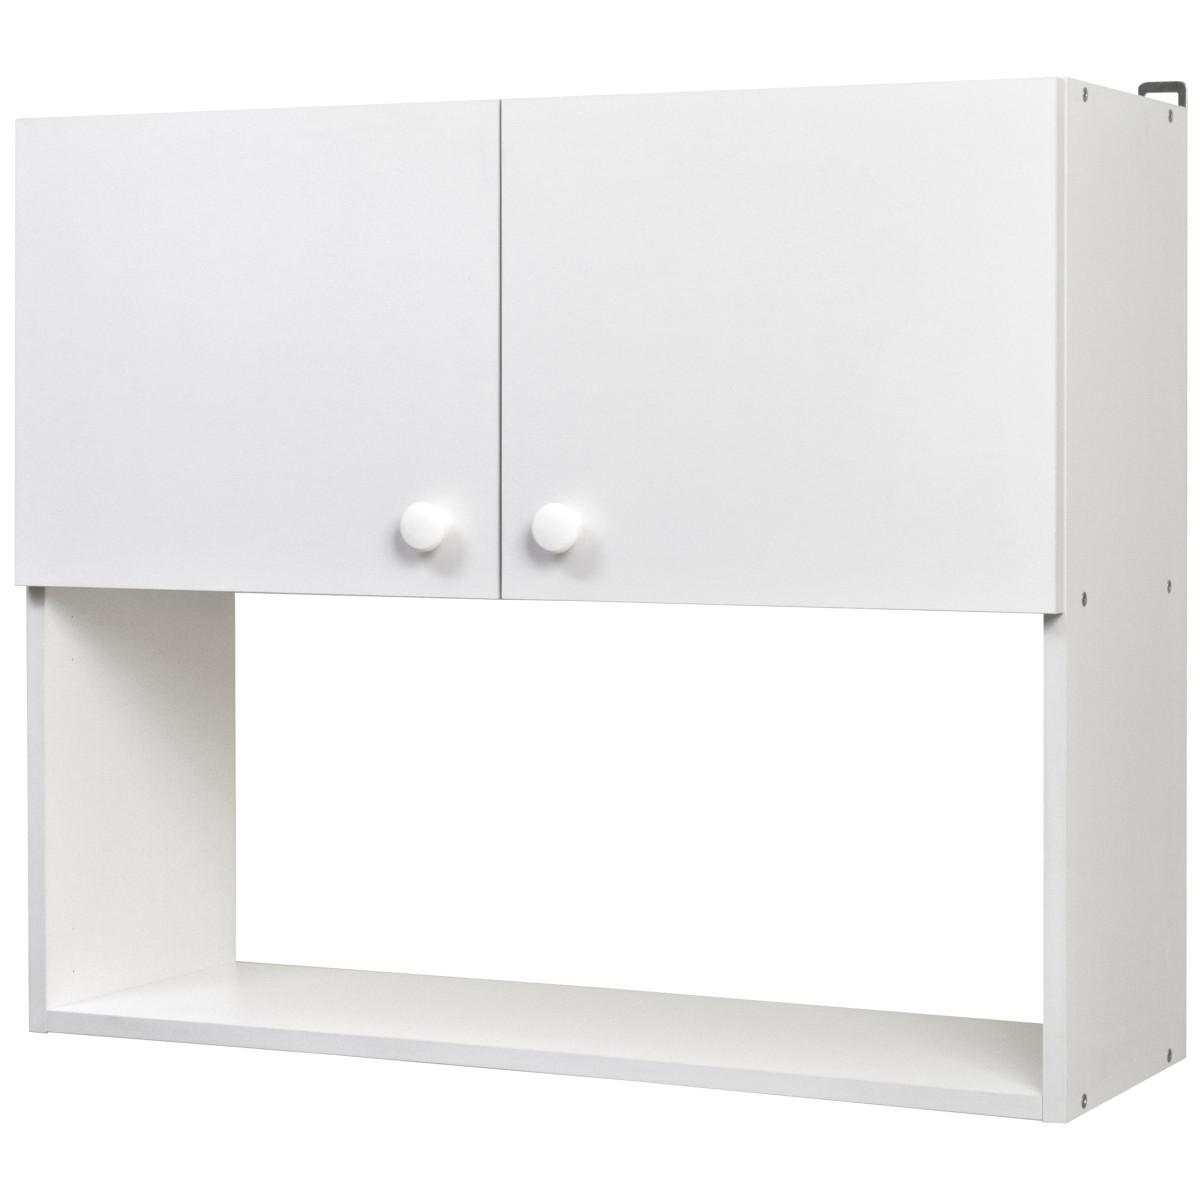 Шкаф навесной Бэлла 80x67.6x29 см ЛДСП цвет белый